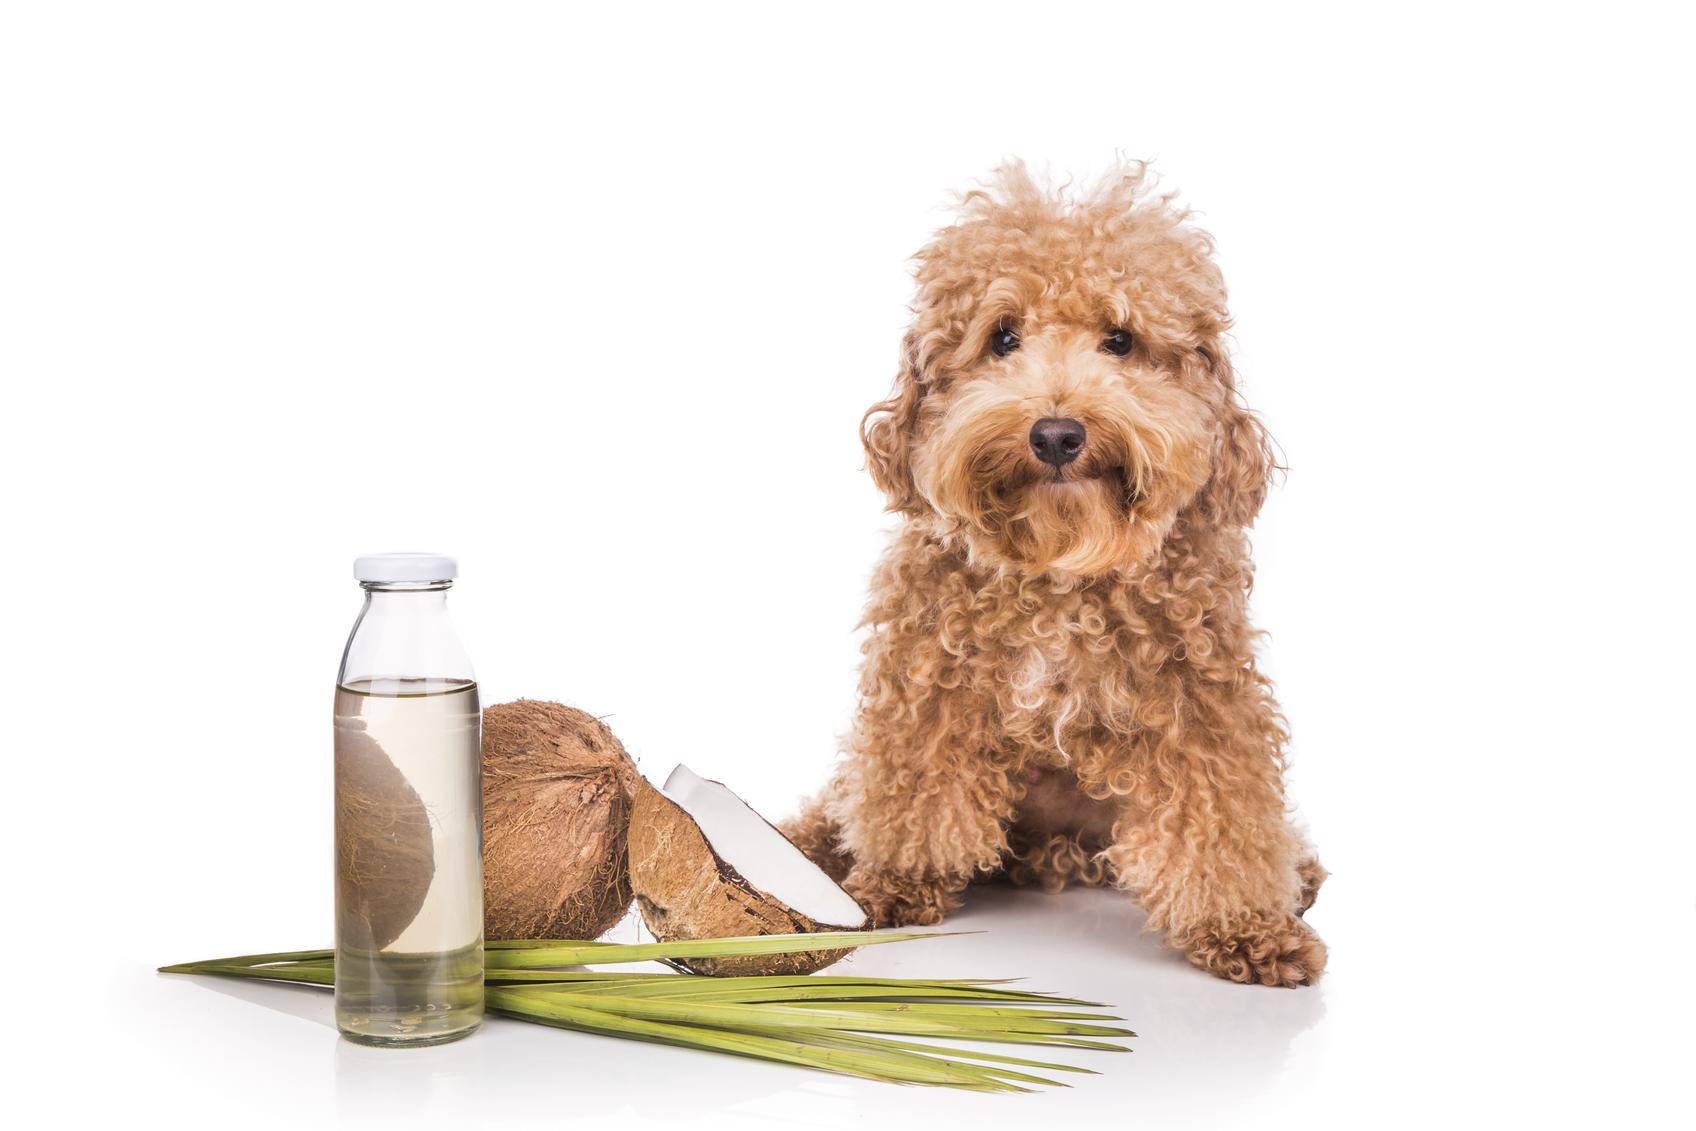 Coconut oil and fats natural ticks fleas repellent for pets